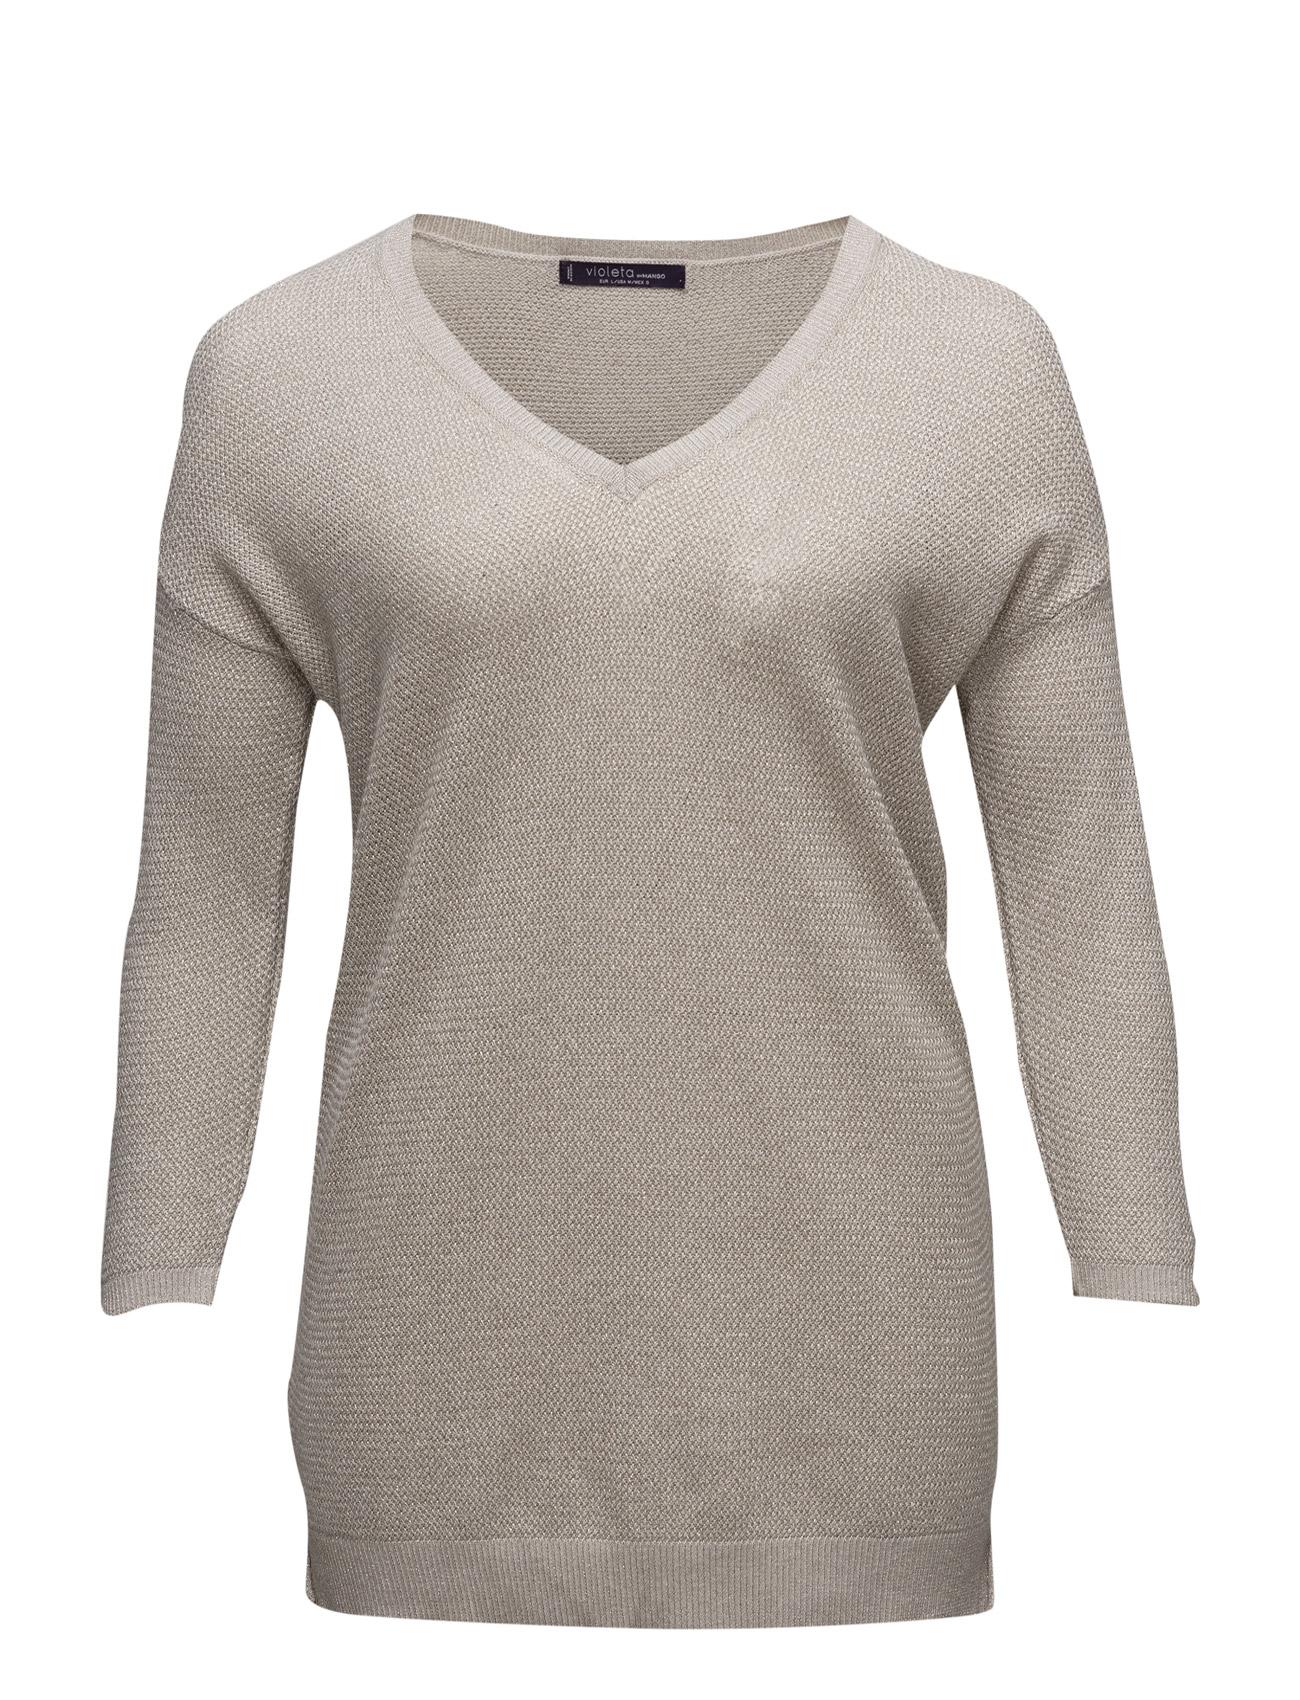 Metallic Wool-Blend Sweater Violeta by Mango Sweatshirts til Kvinder i Lt Pastel Brown